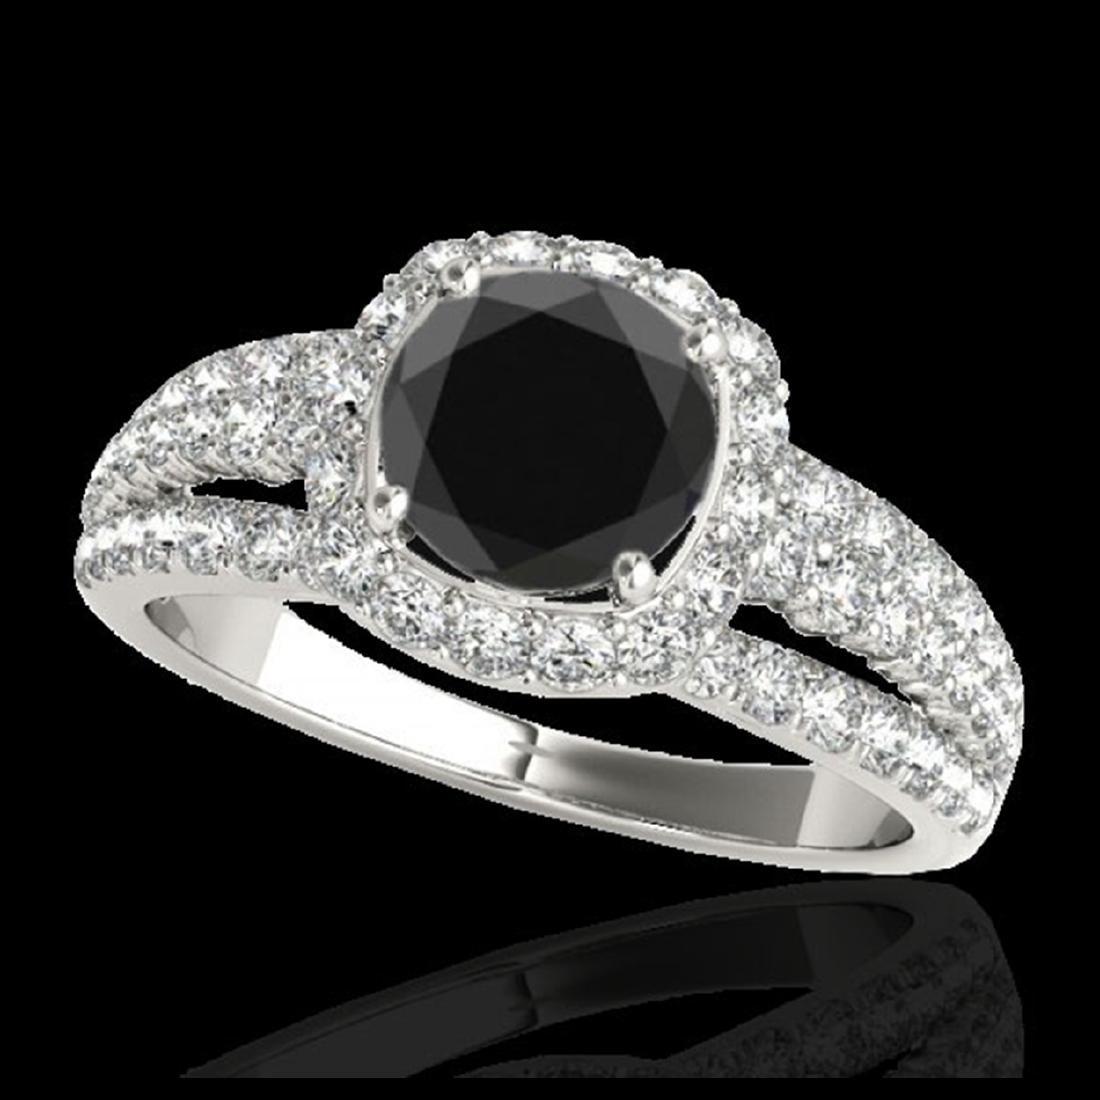 2.25 ctw VS Black Diamond Solitaire Halo Ring 10K White